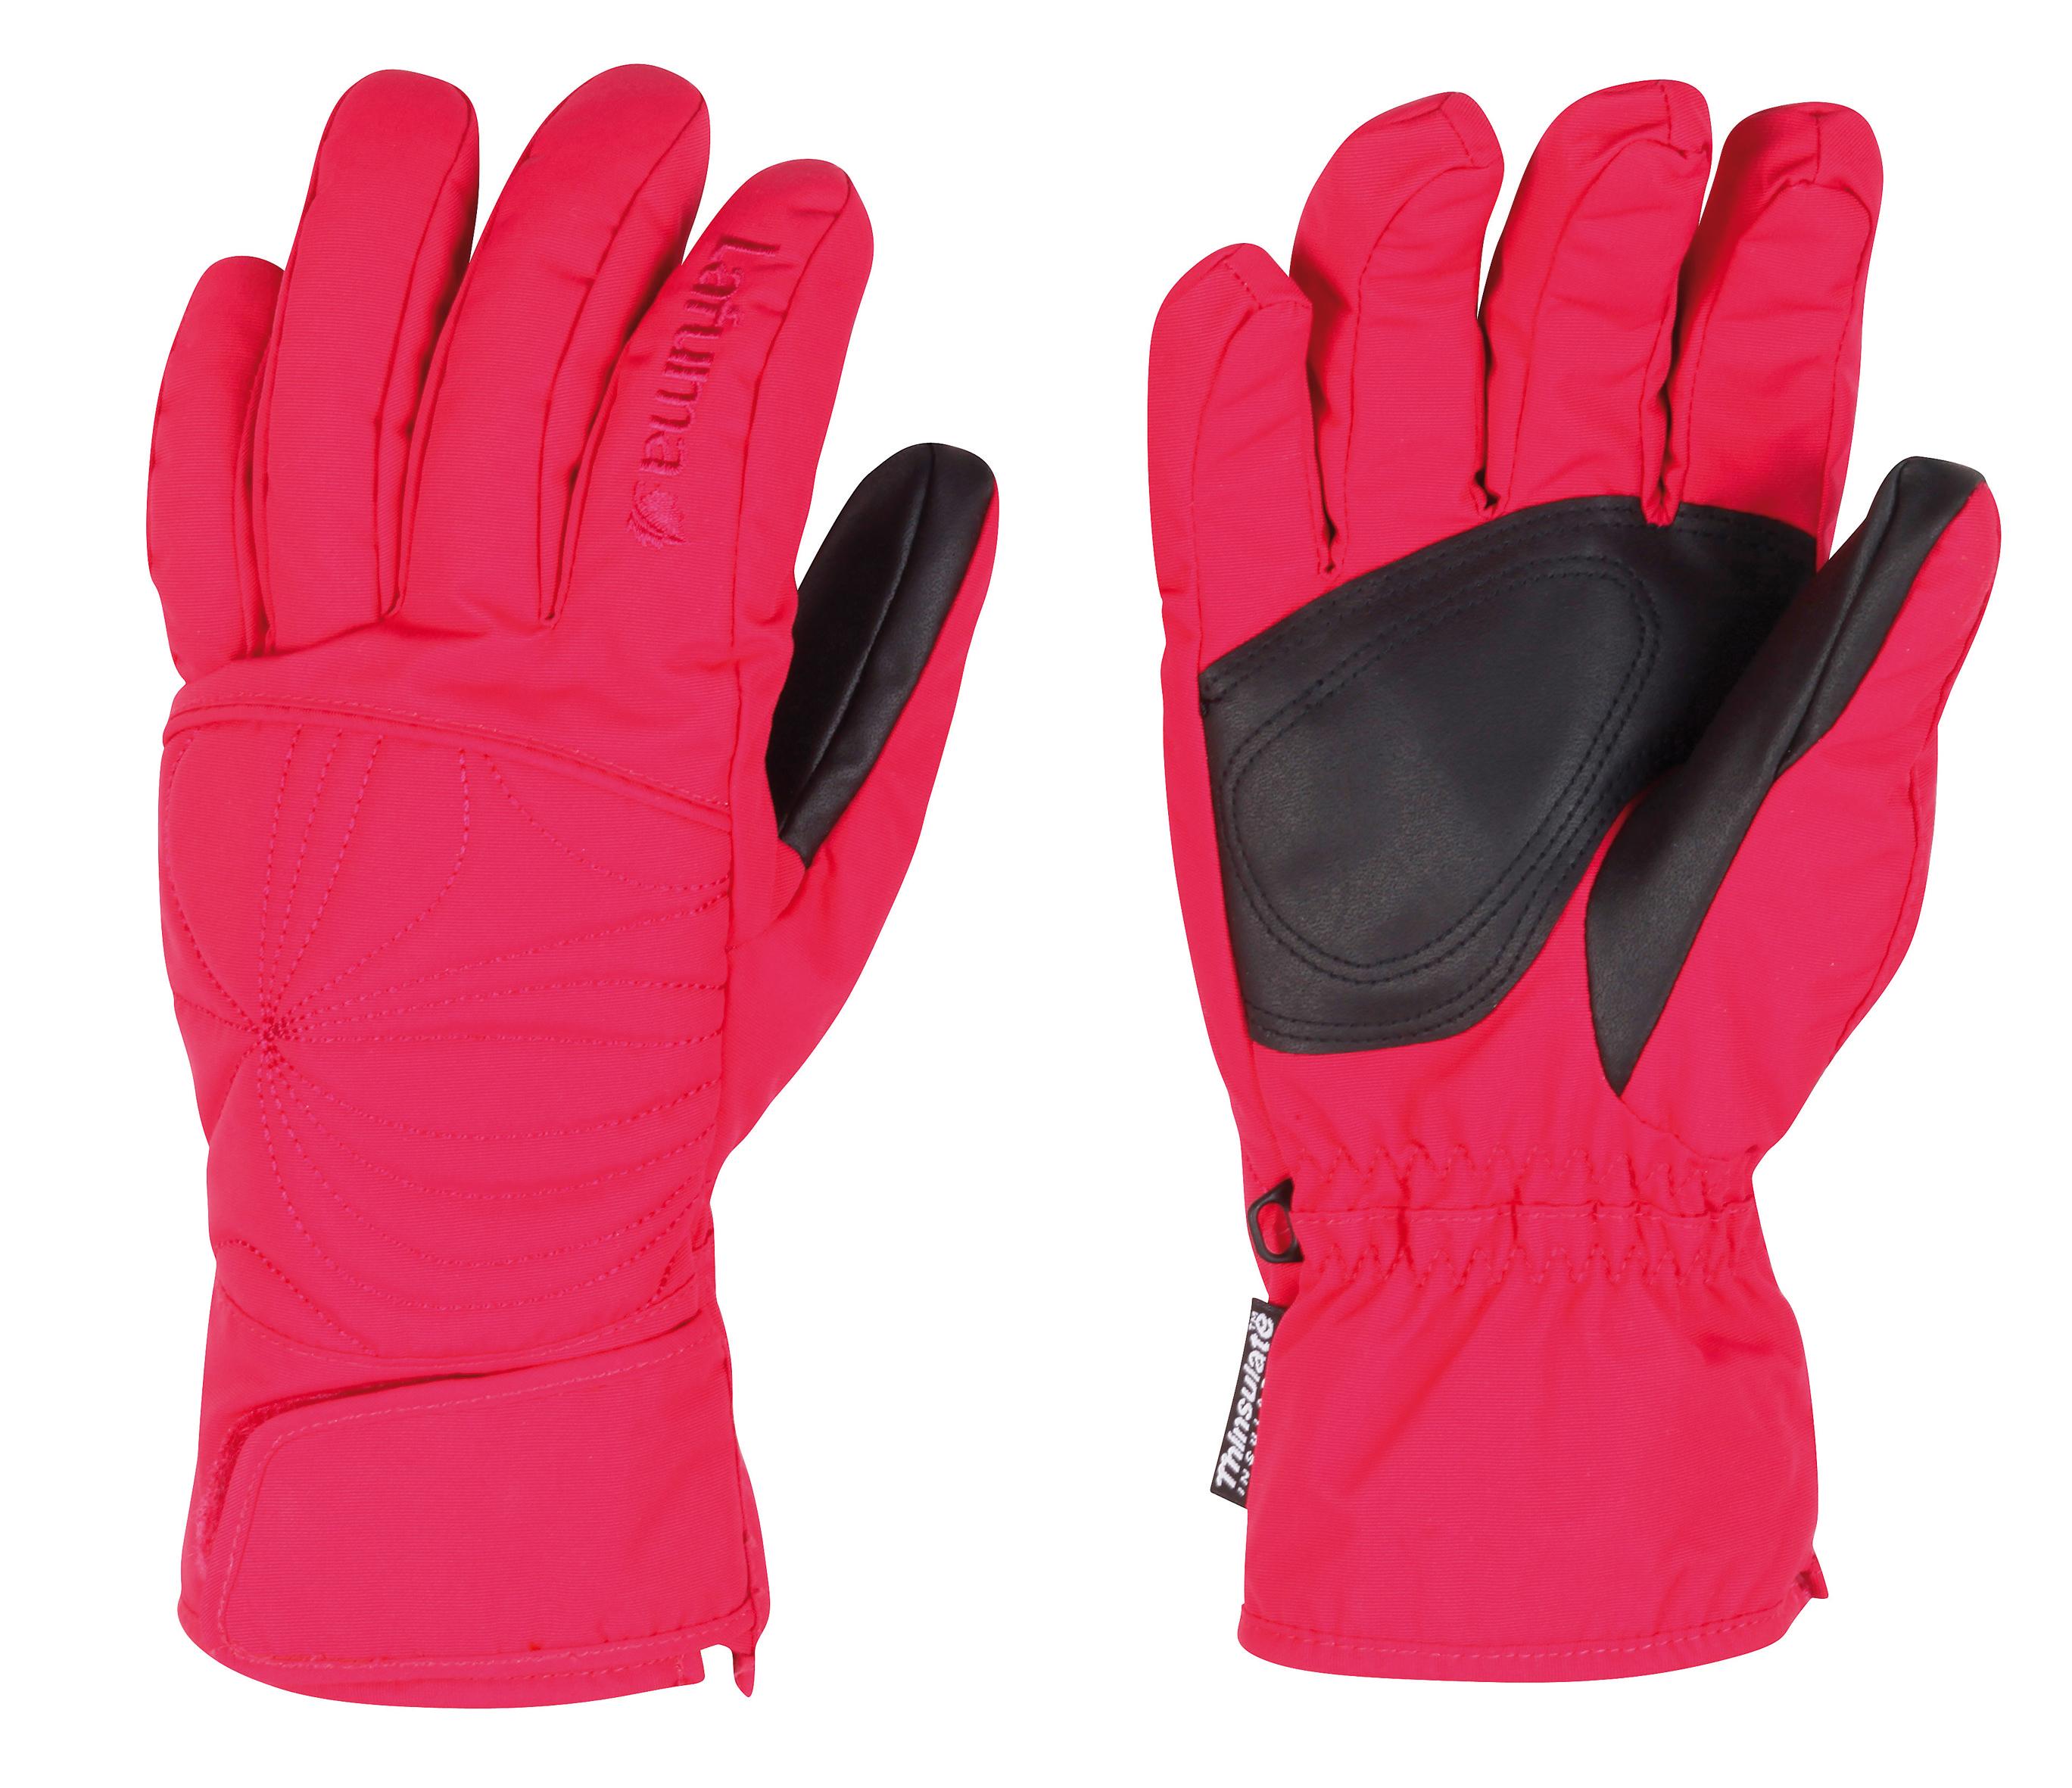 gants de ski femme lafuma kama tous les gants. Black Bedroom Furniture Sets. Home Design Ideas